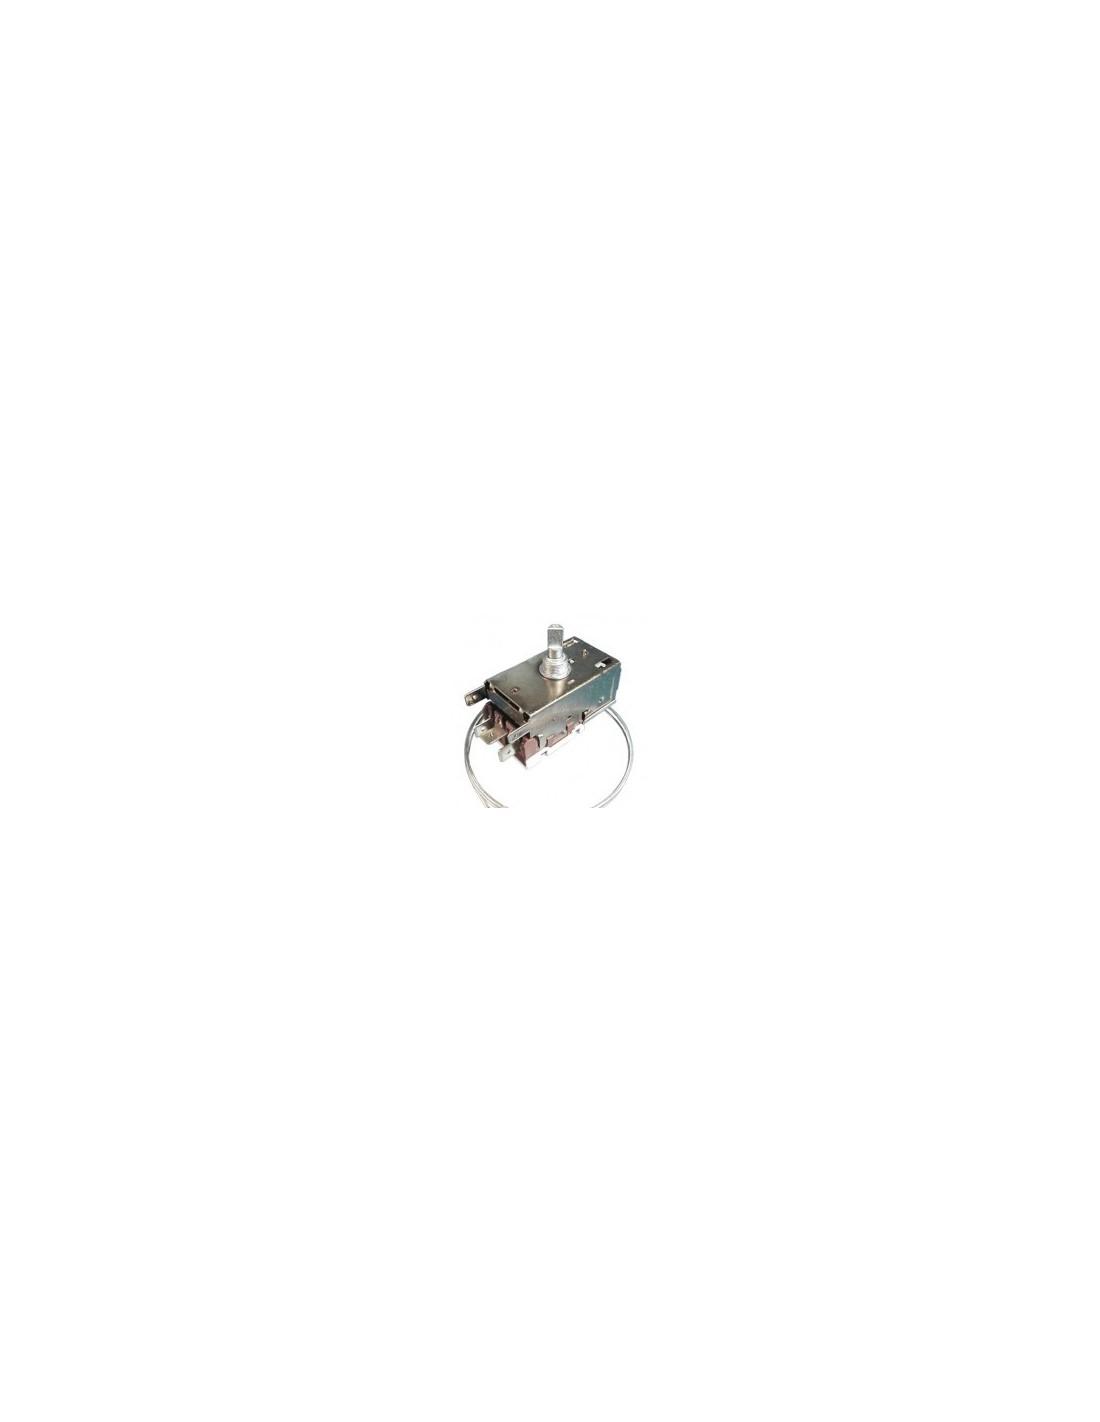 ELM02149 - Thermostat TS RANCO K50-L3100